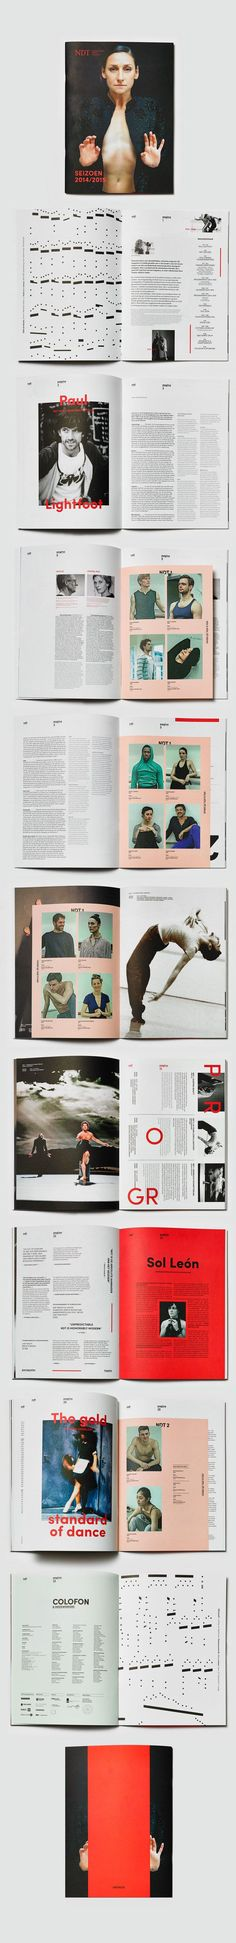 Nederlands Dans Theater by Studio Beige | Design / Layouts | Pinterest